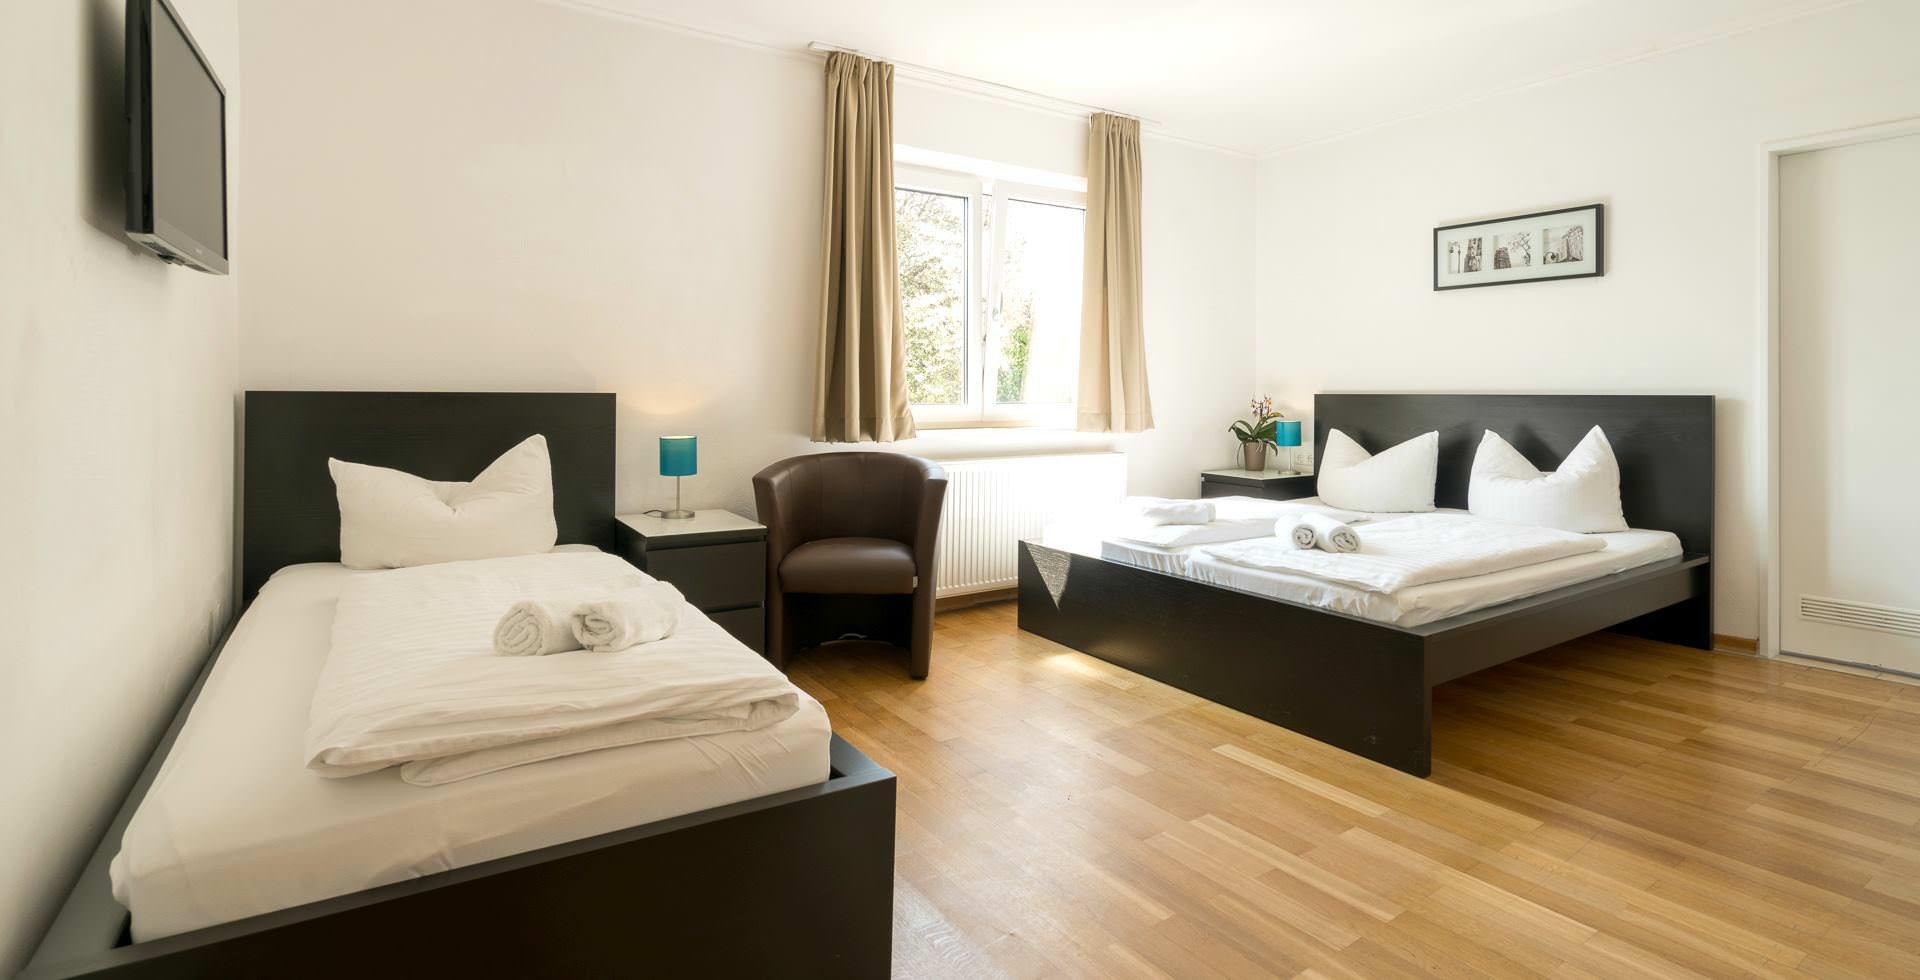 g nstig schlafen in m nchen hotel pension in m nchen. Black Bedroom Furniture Sets. Home Design Ideas